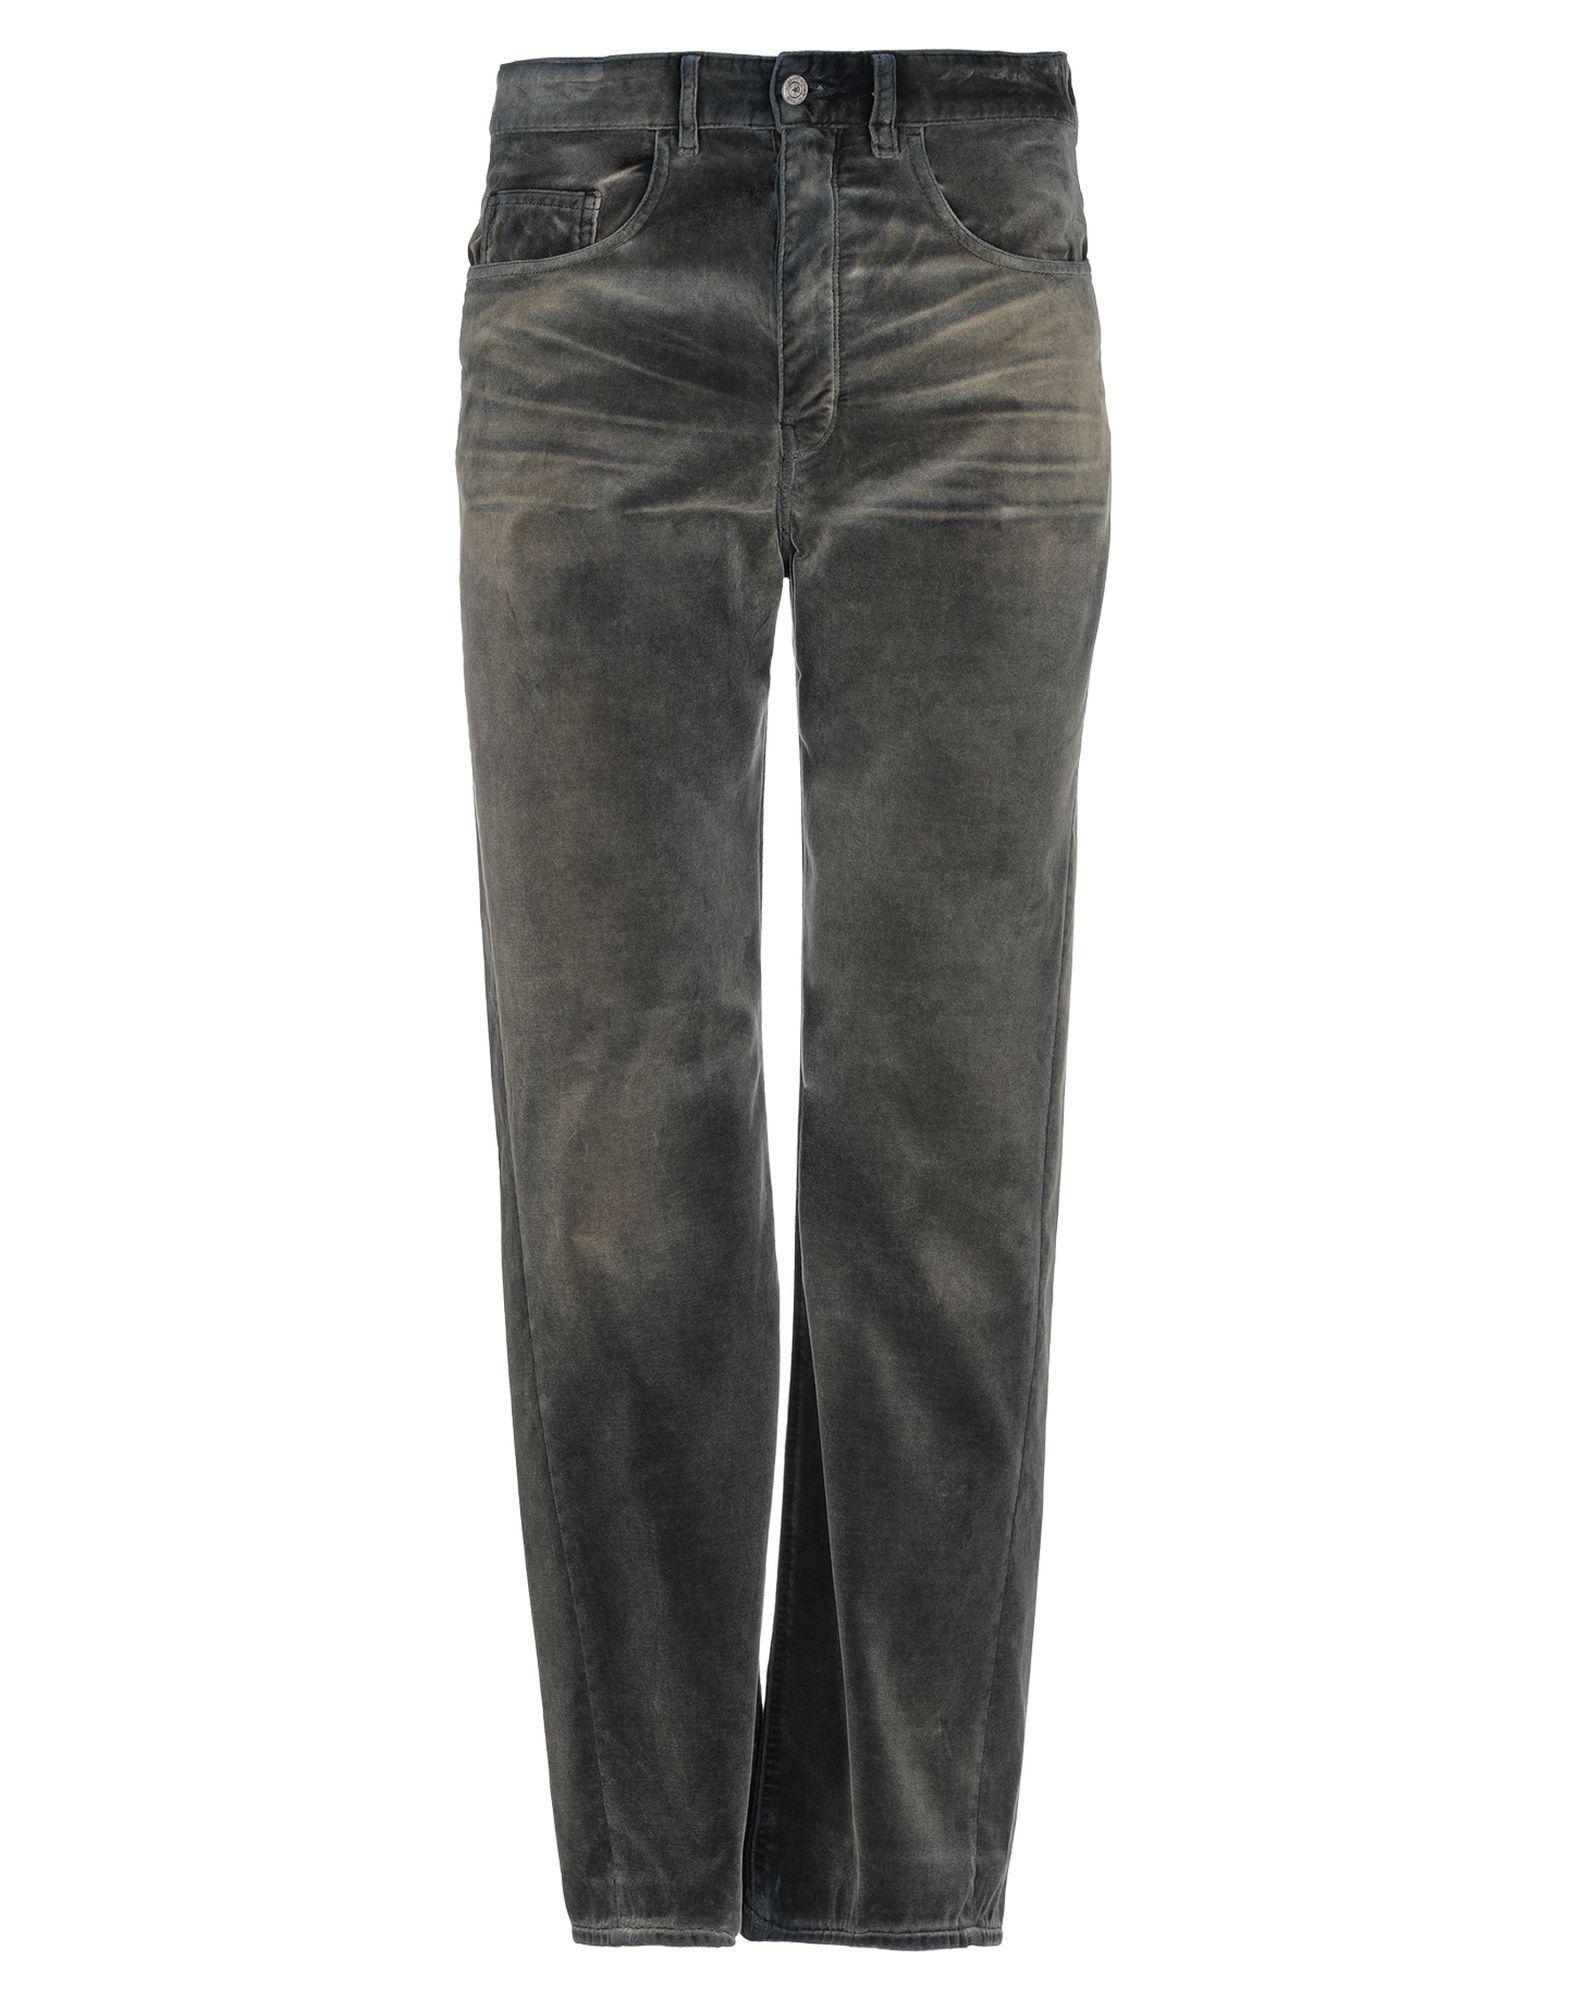 GOLDEN GOOSE DELUXE BRAND Повседневные брюки цена